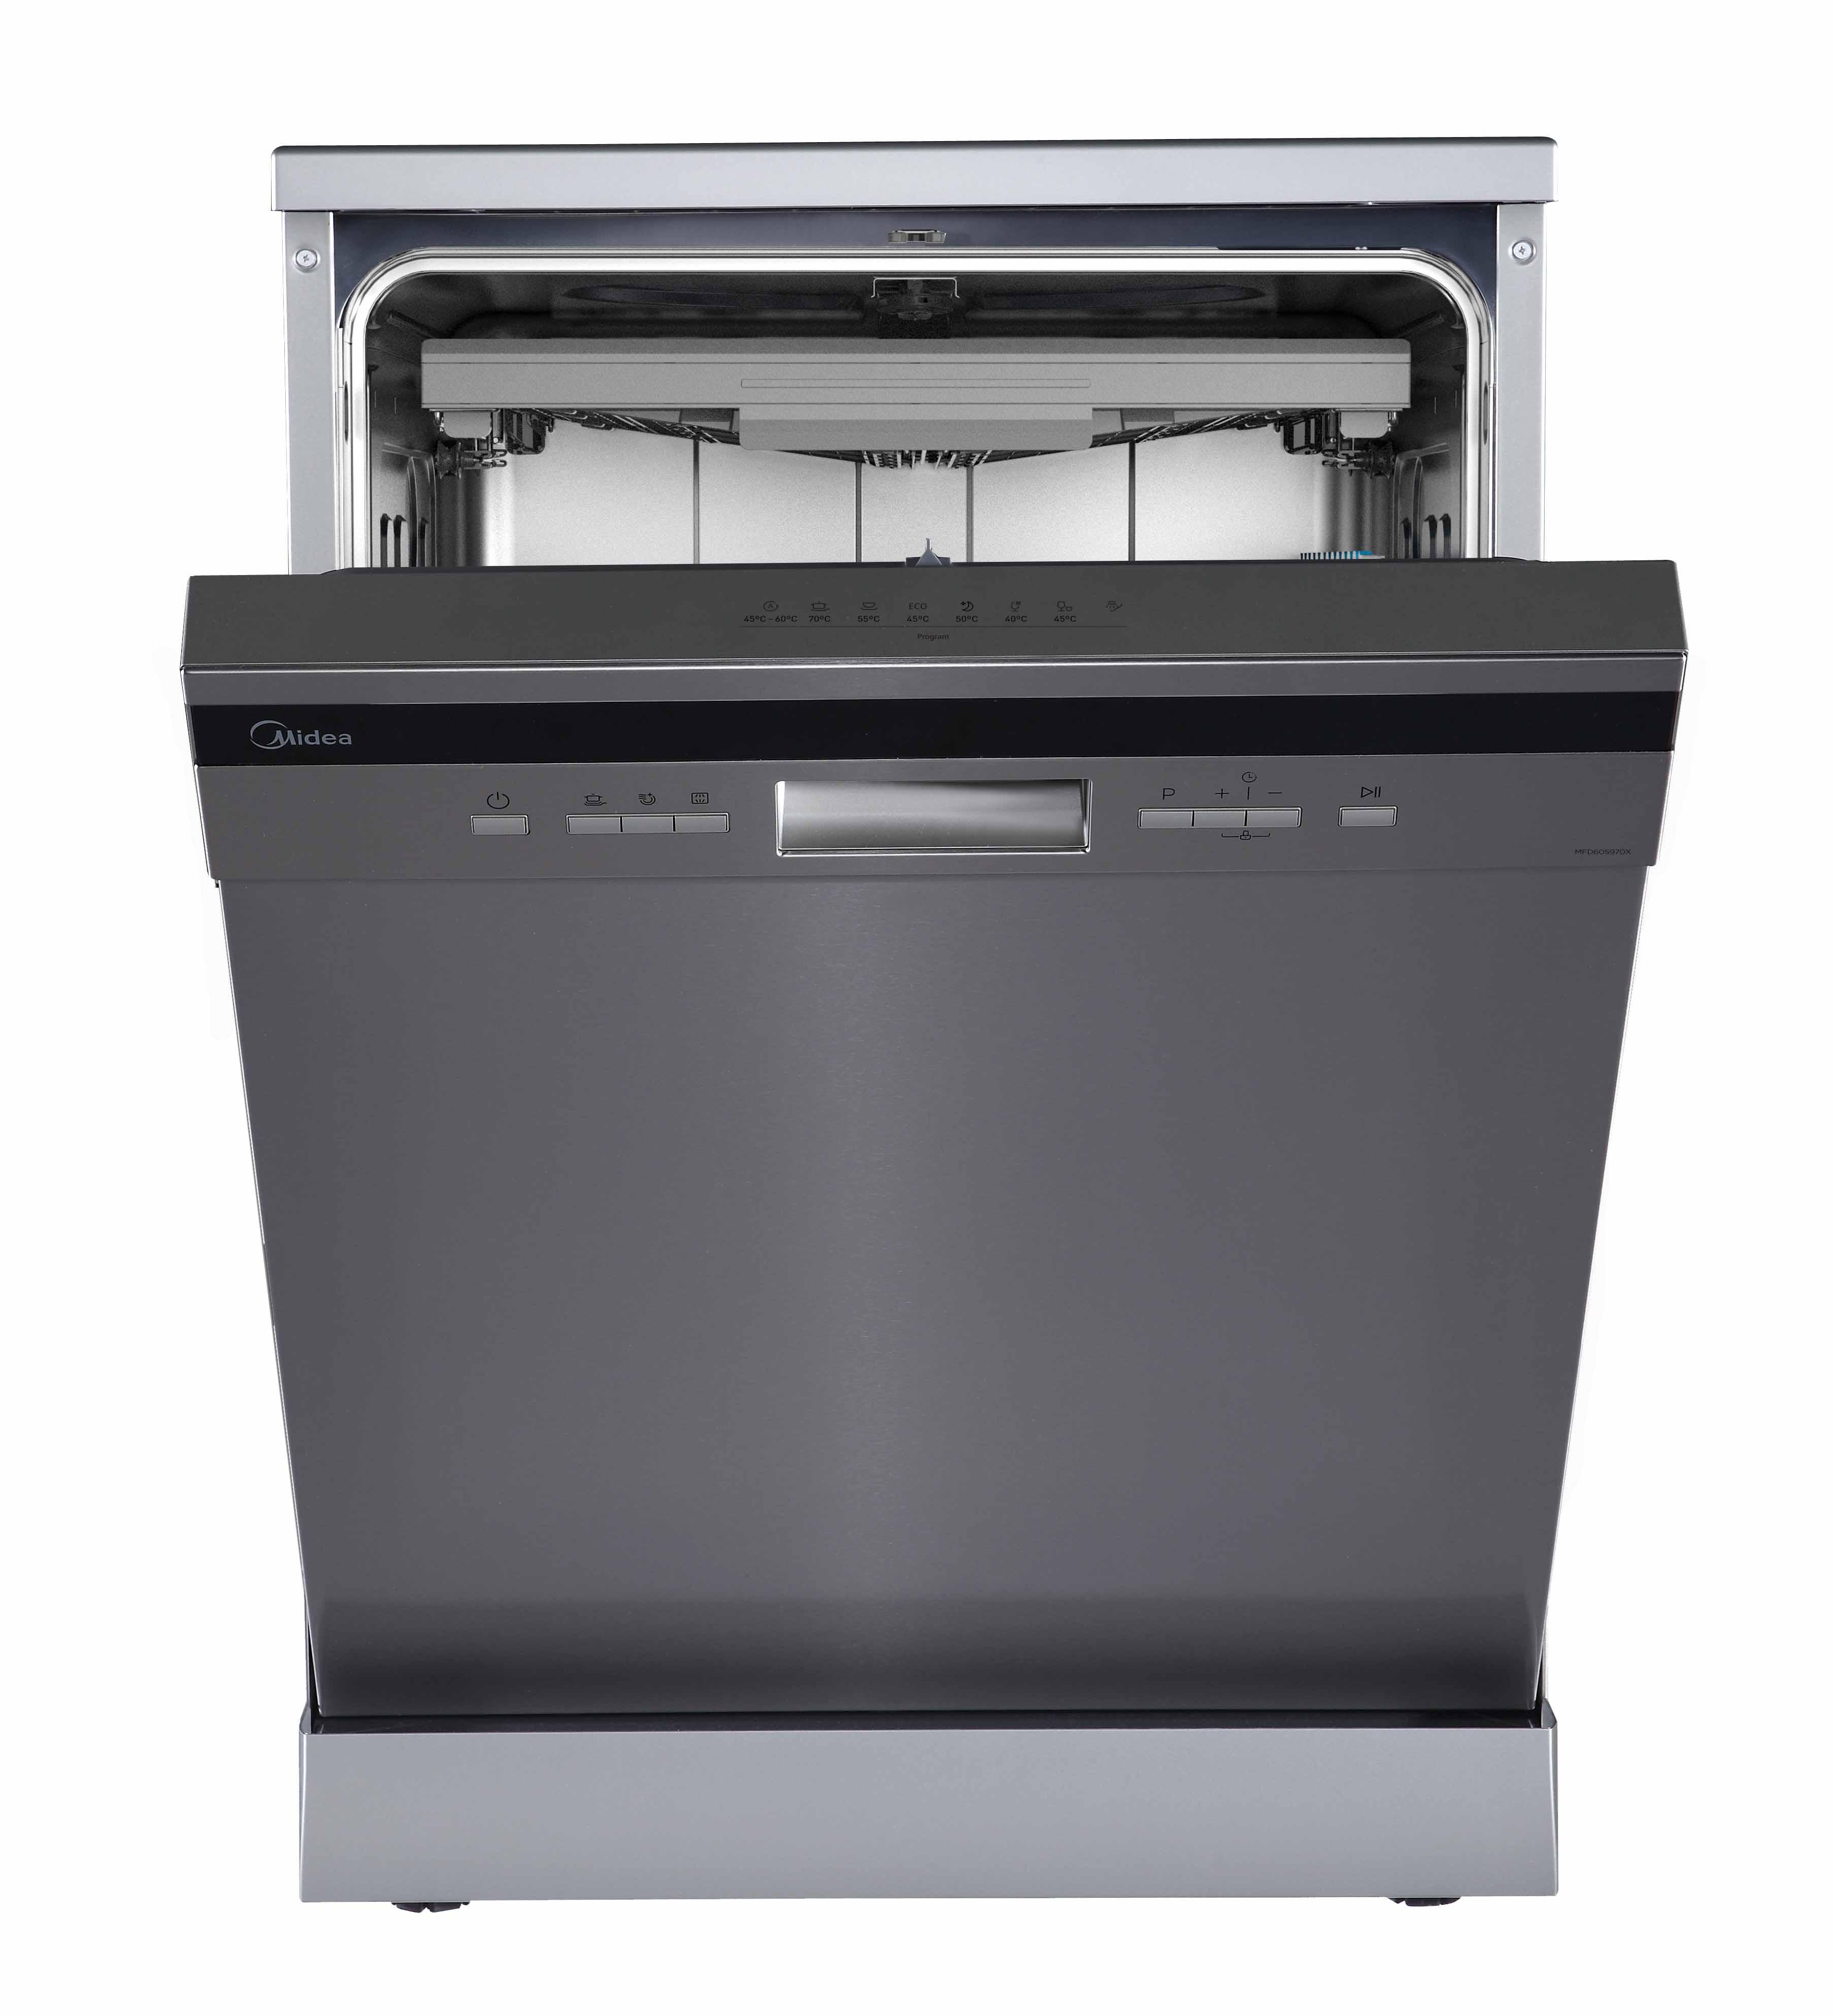 Посудомоечная машина Midea MFD60S970X фото